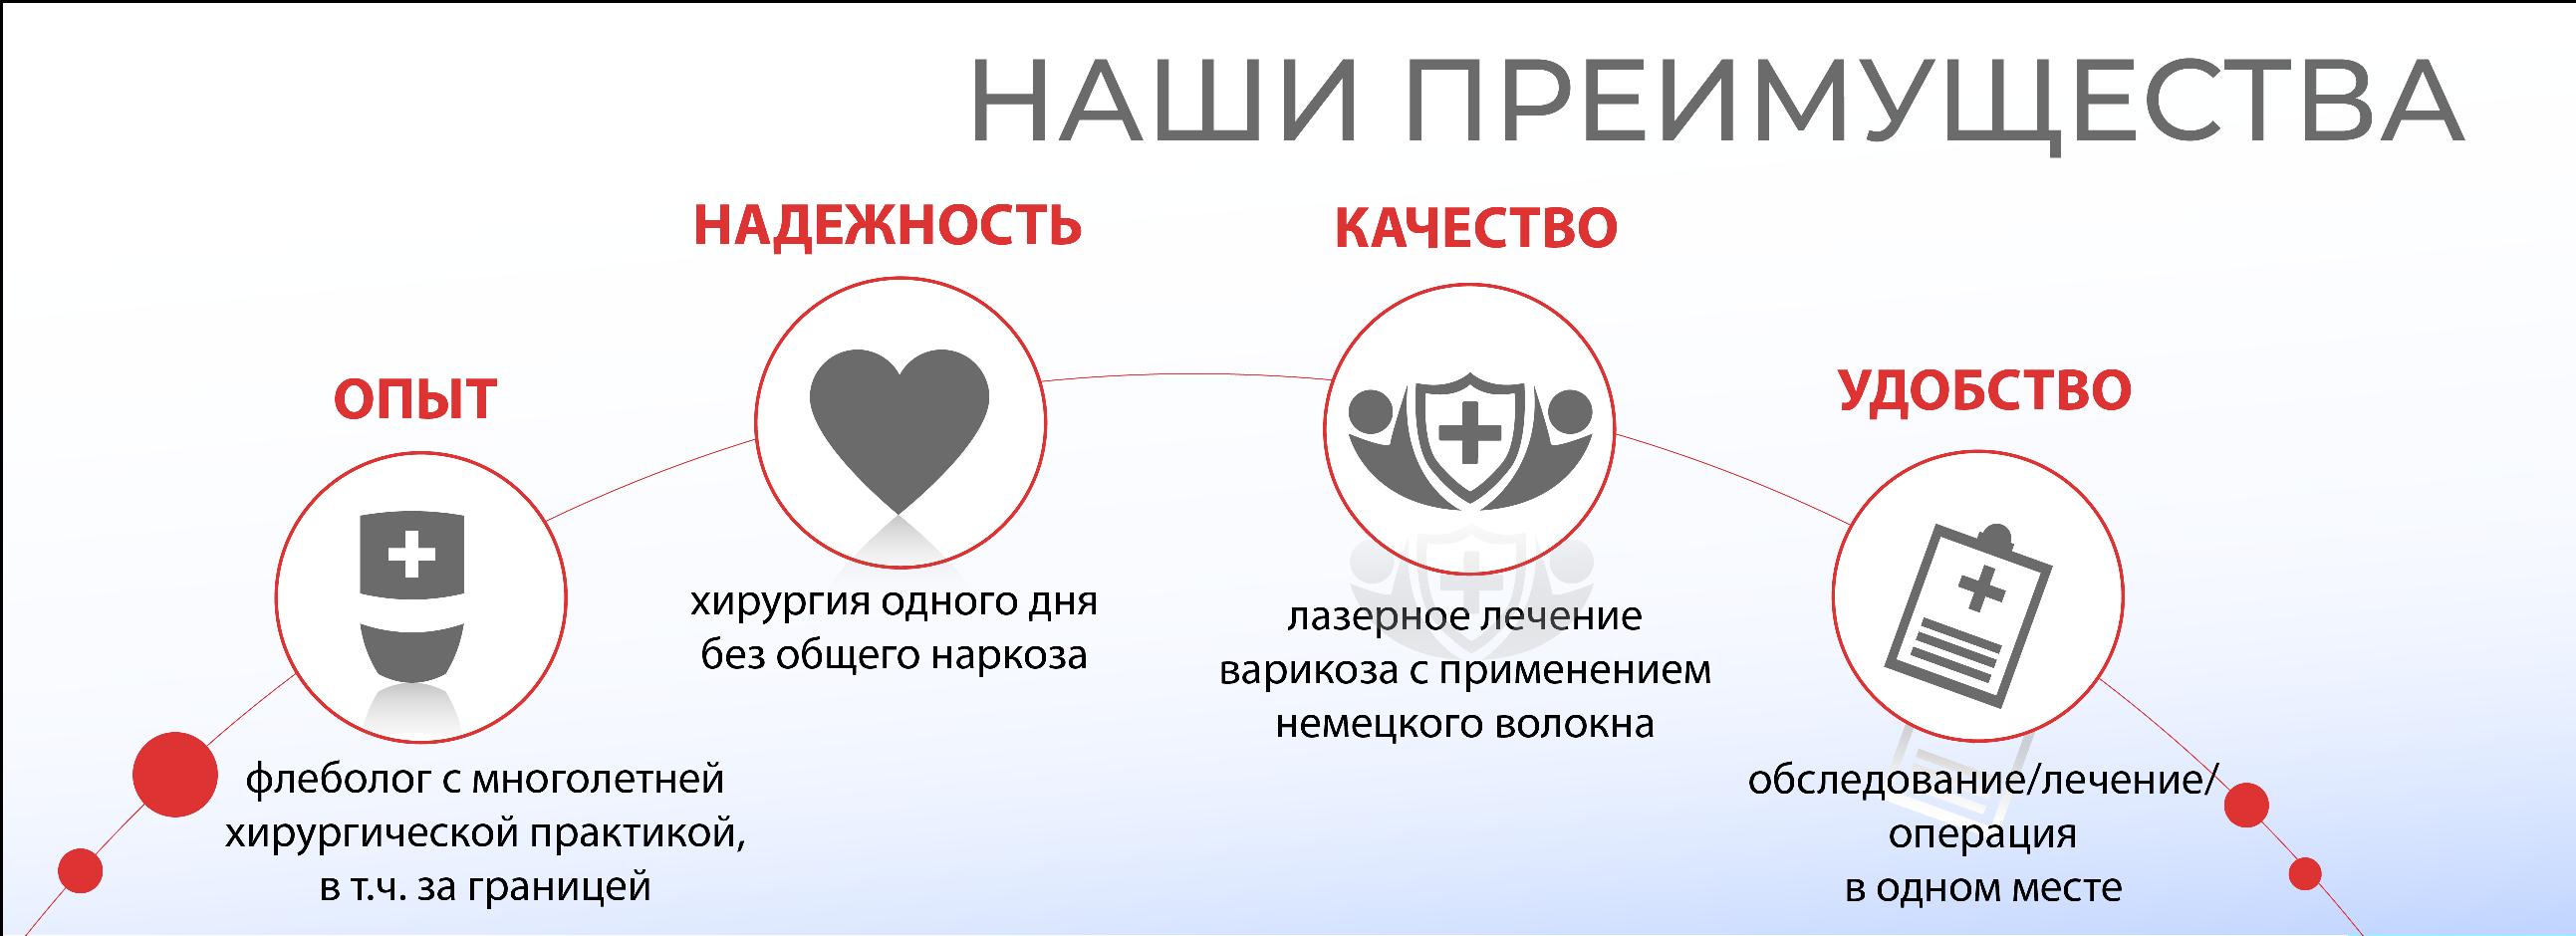 flebolog_kiev